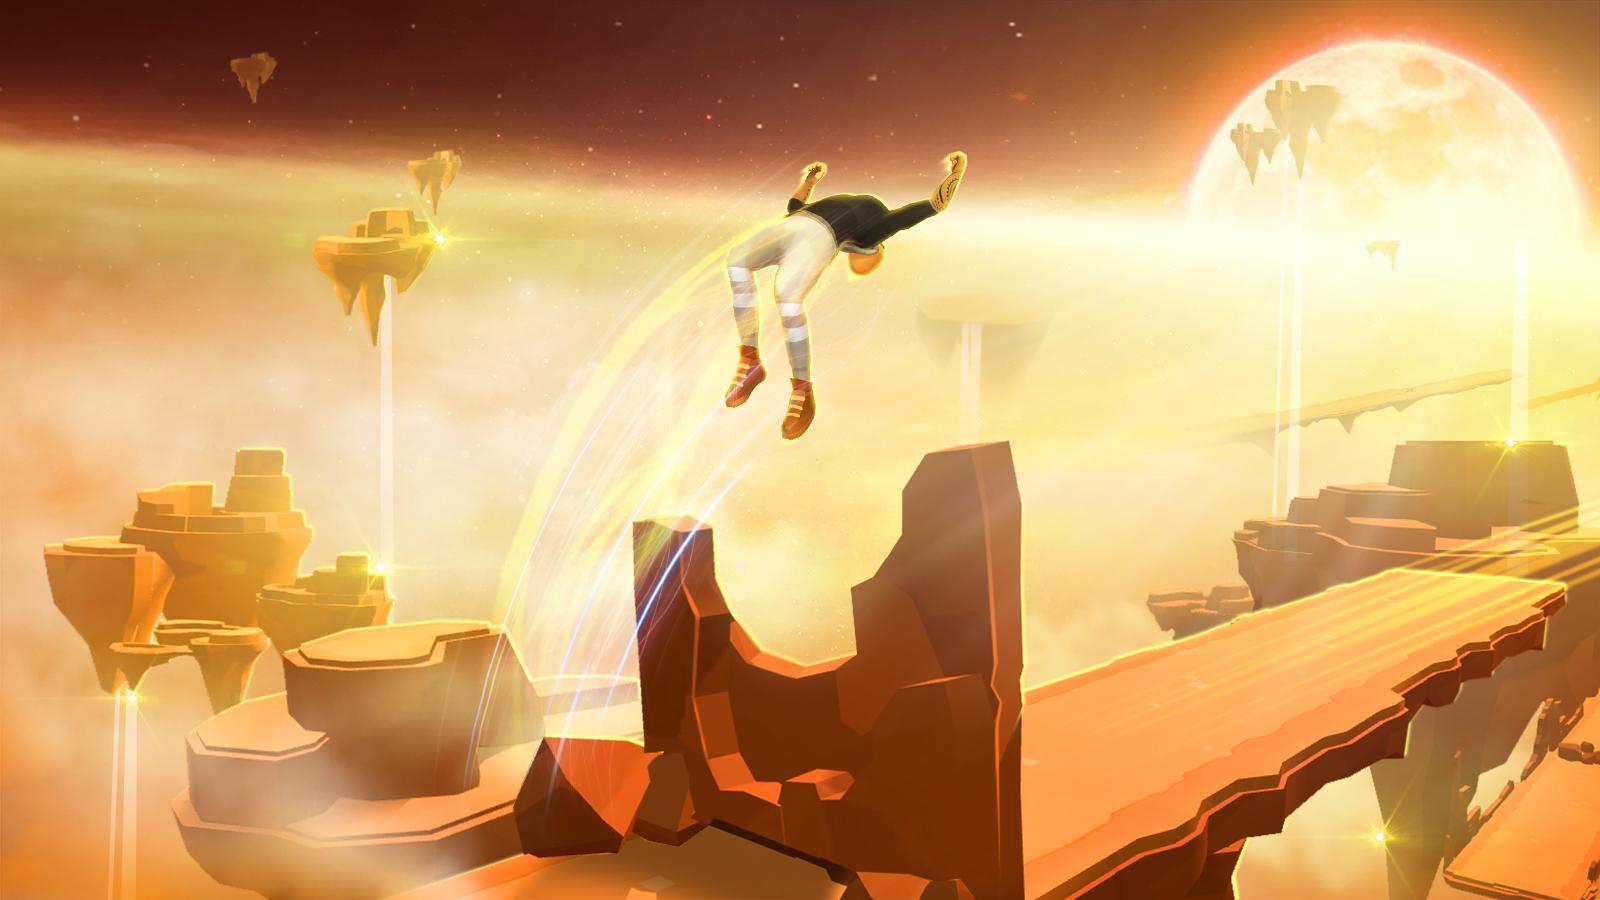 Sky Dancer Run - Running Game 4.2.0 Screenshot 2